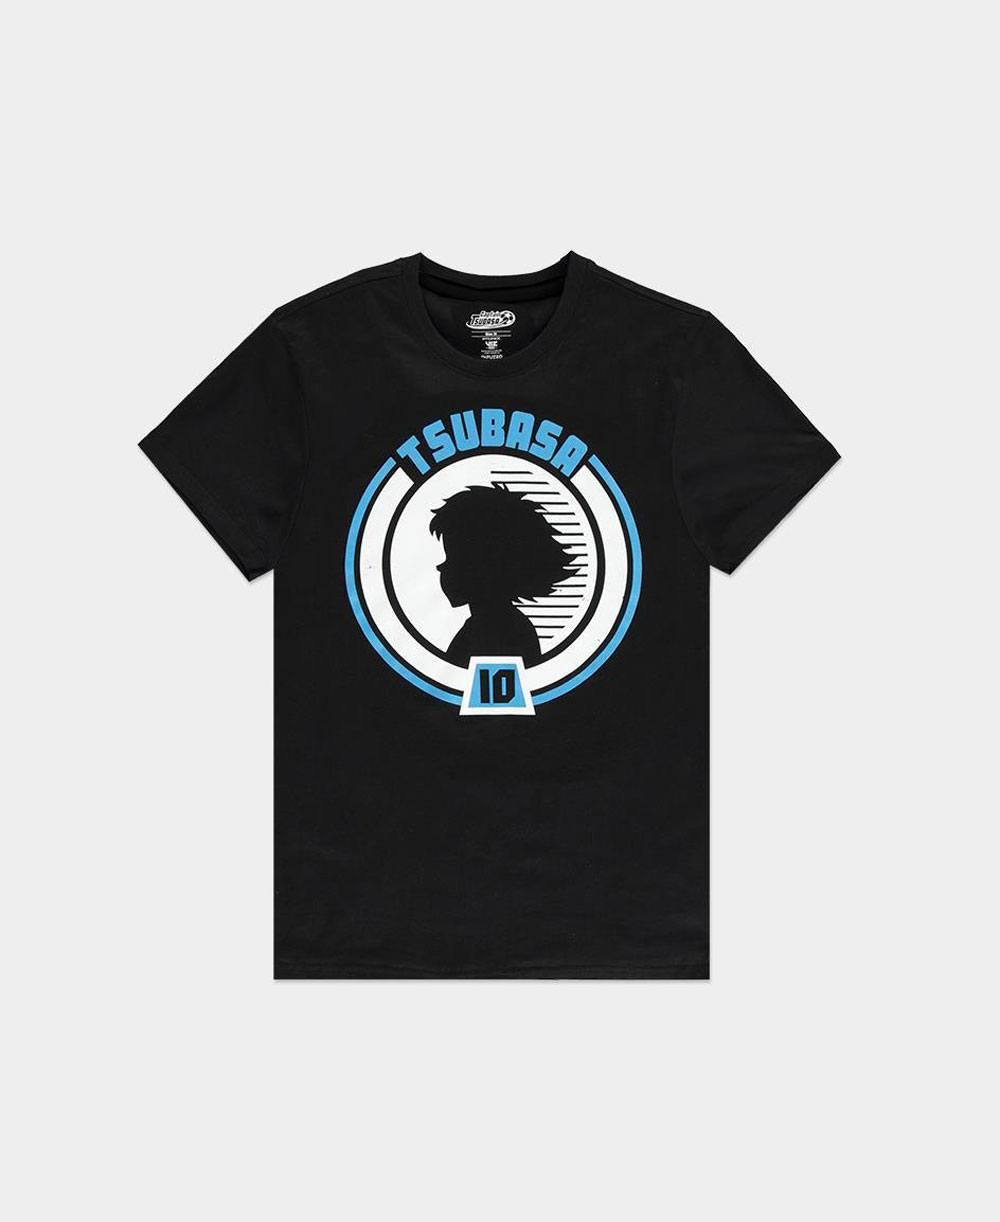 Captain Tsubasa T-Shirt Tsubasa Badge Size S